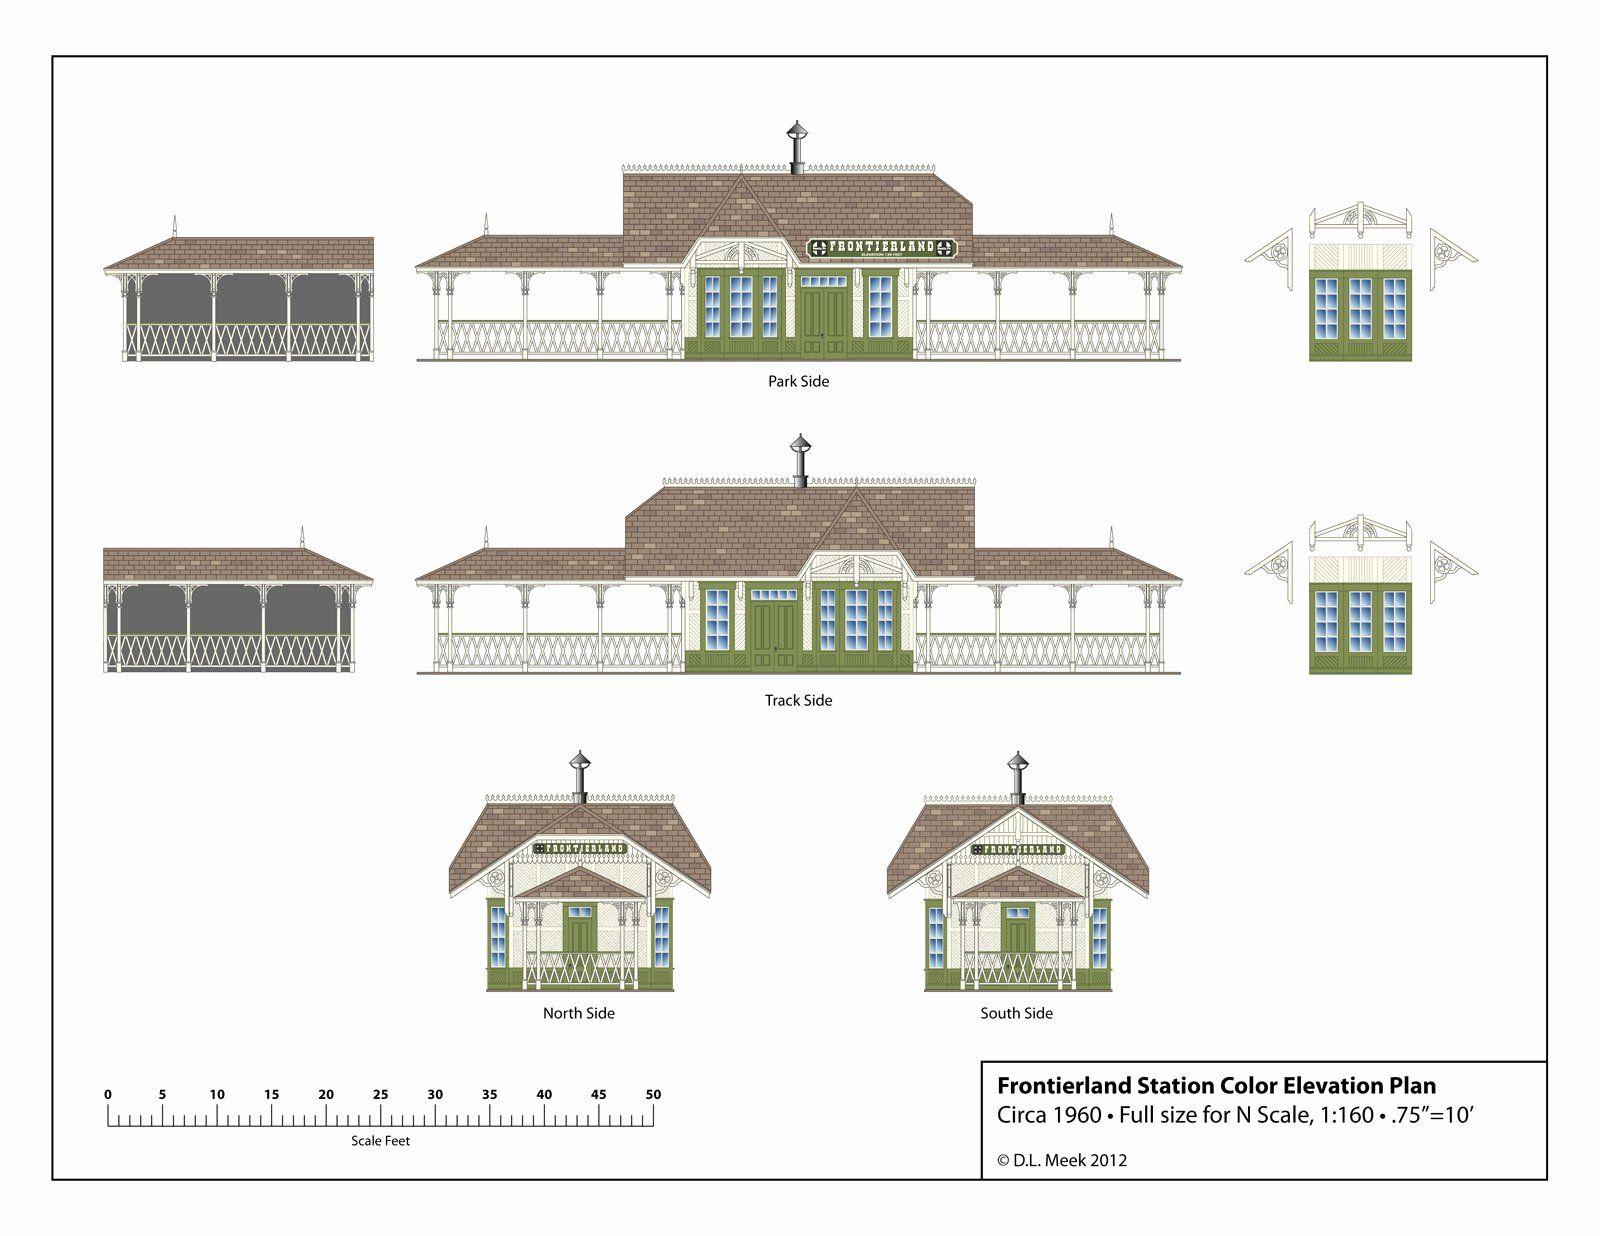 Scale Model House Plans Elegant Disneyland Frontierland Station Plan Free Download In 2020 Model House Plan Model Homes Ho Scale Buildings